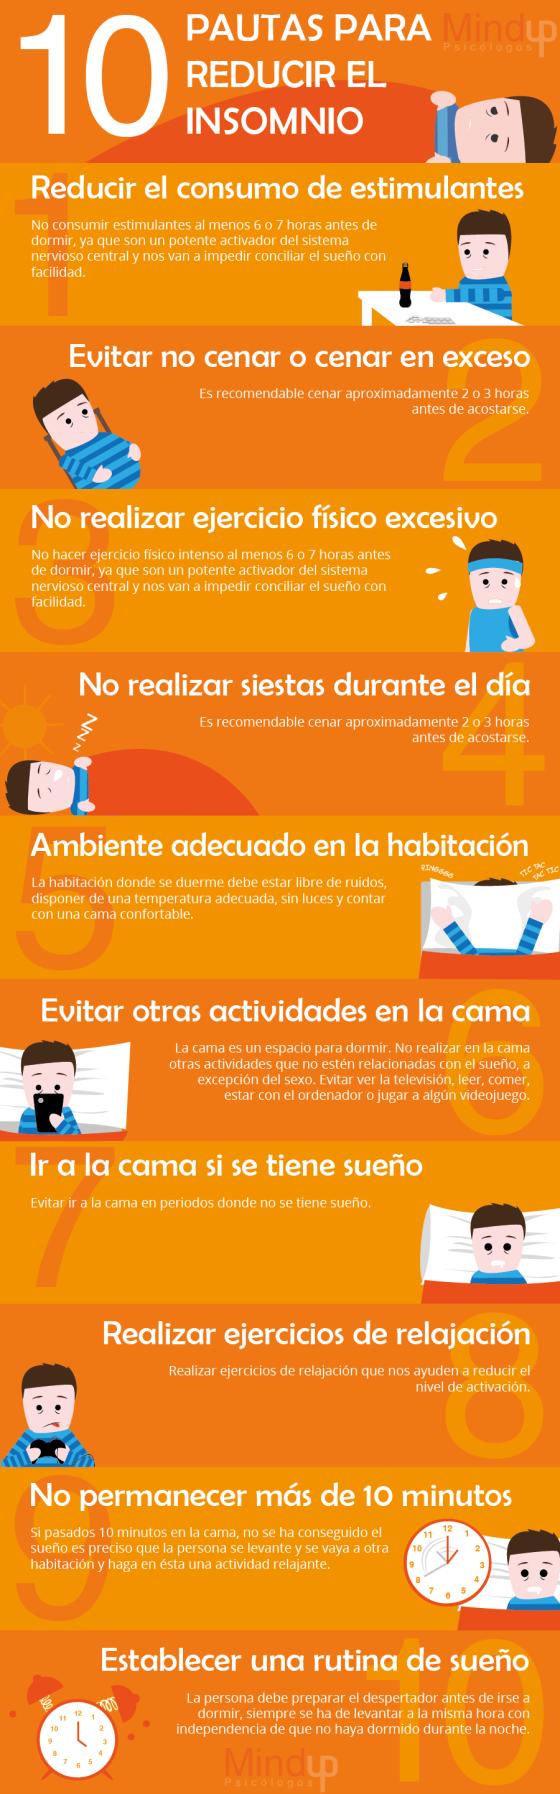 10-pautas-para-reducir-el-insomnio-infografia-min